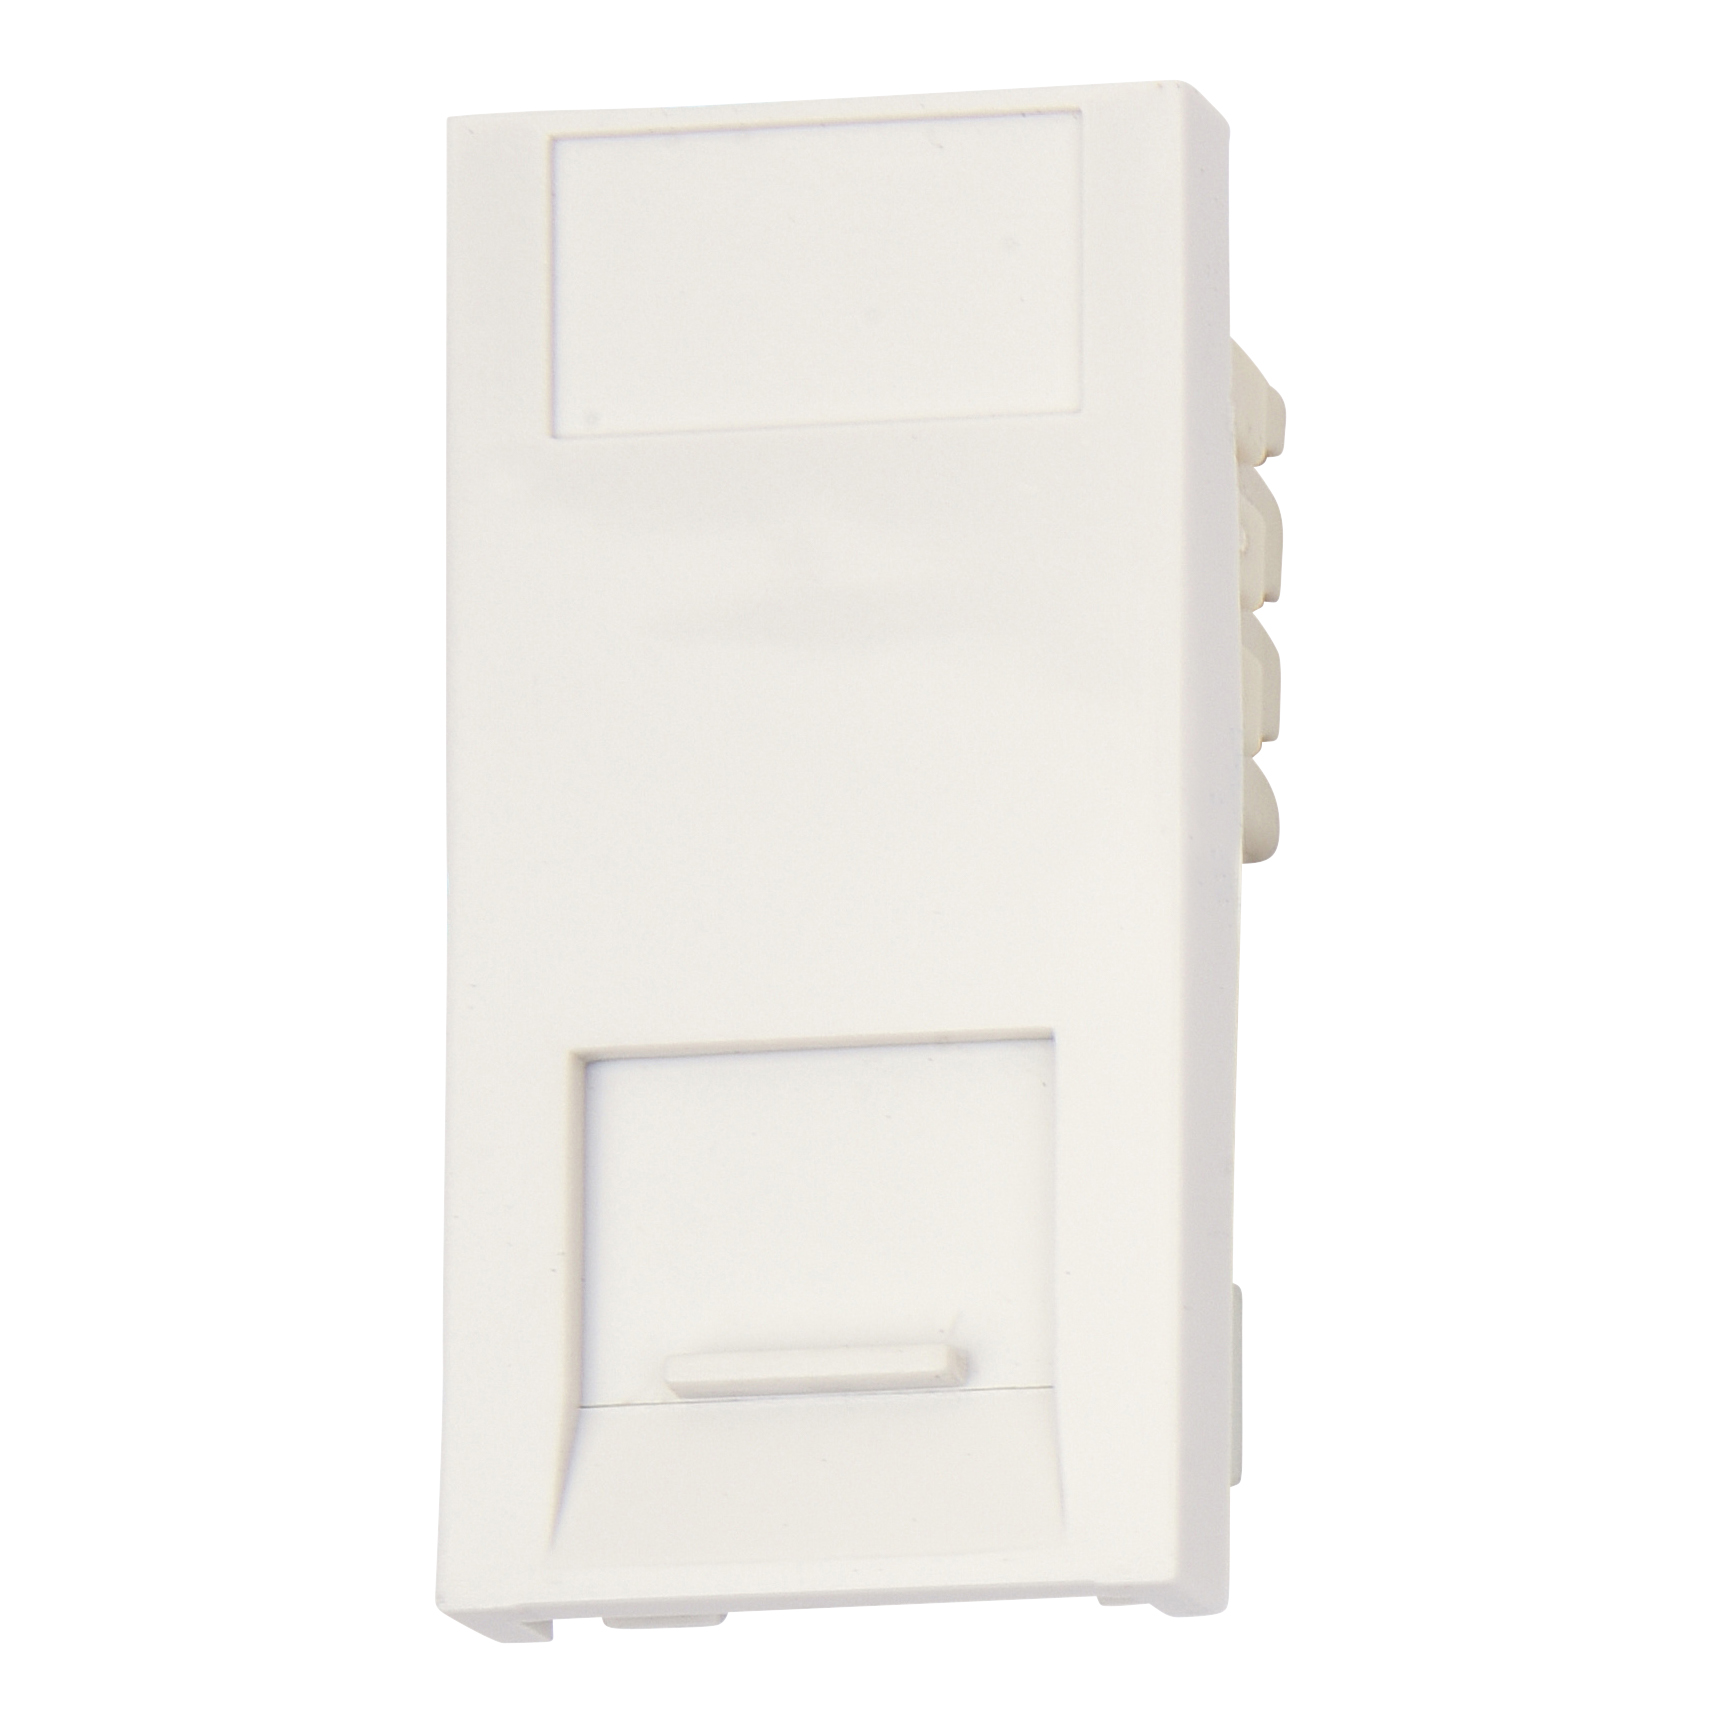 Deta Telephone Secondary Module - White